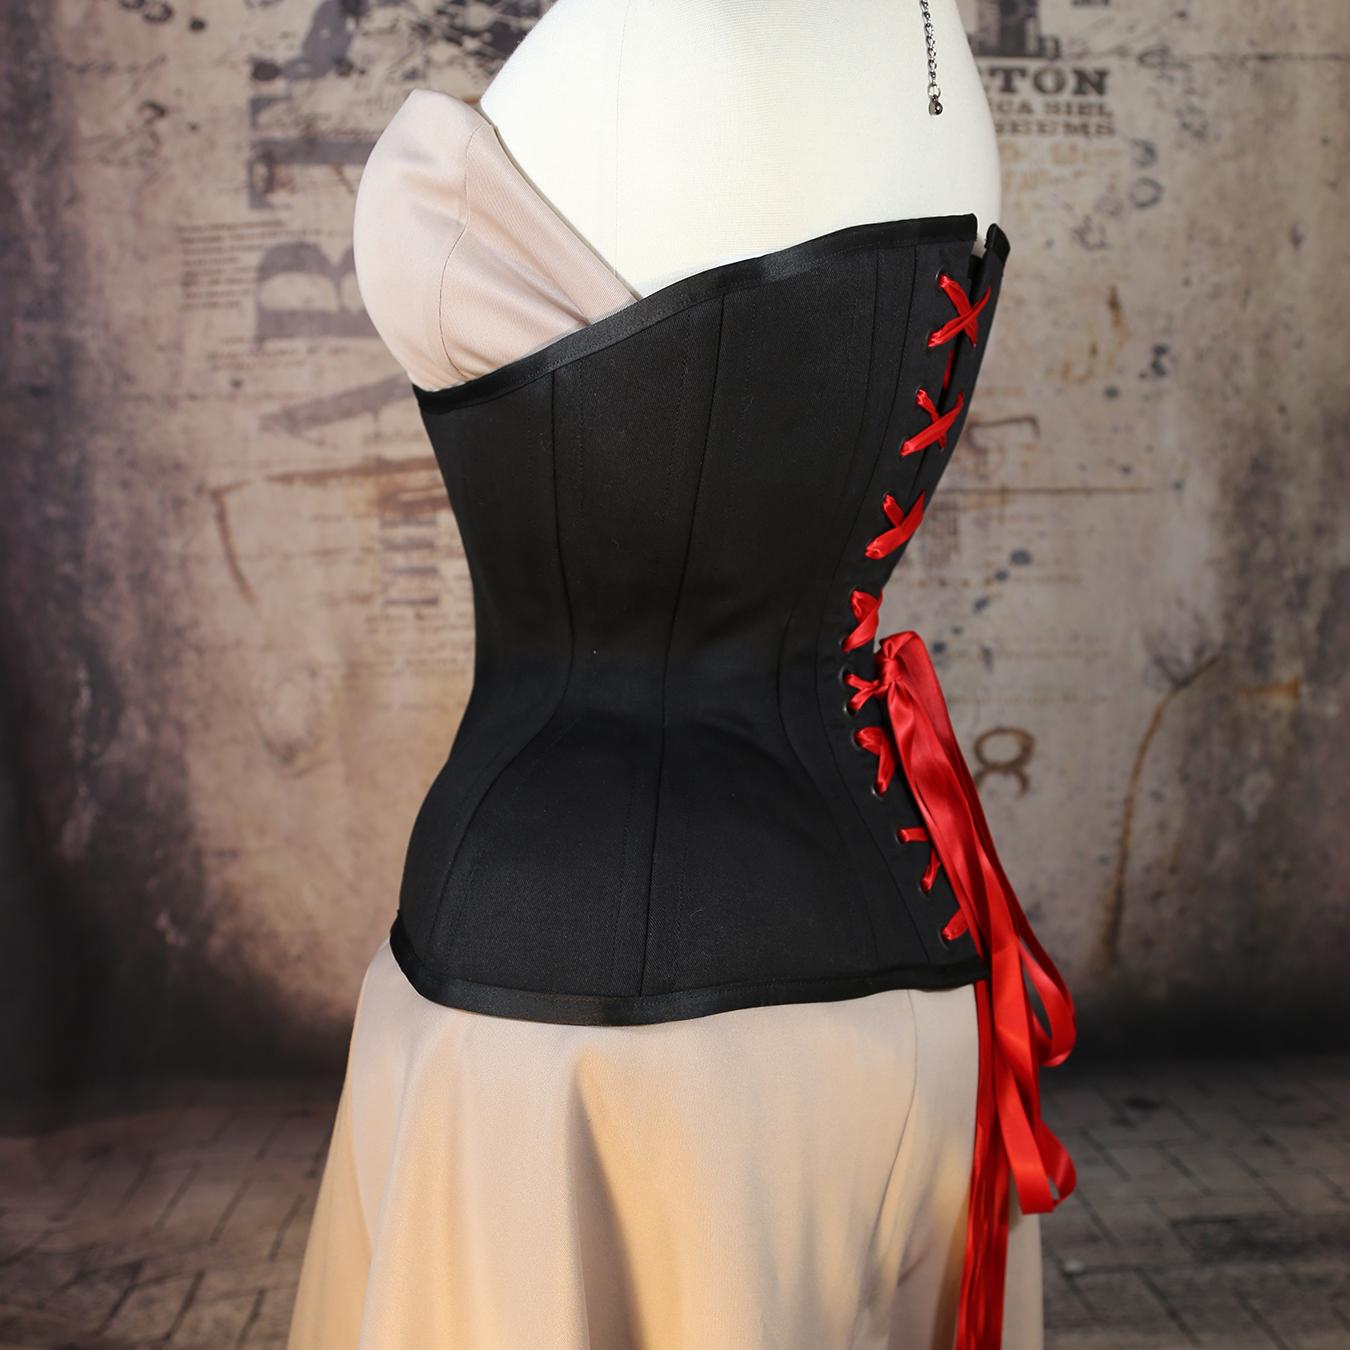 b1ba76b98b MCC112 Long Line Long Torso Black Cotton Underbust corset